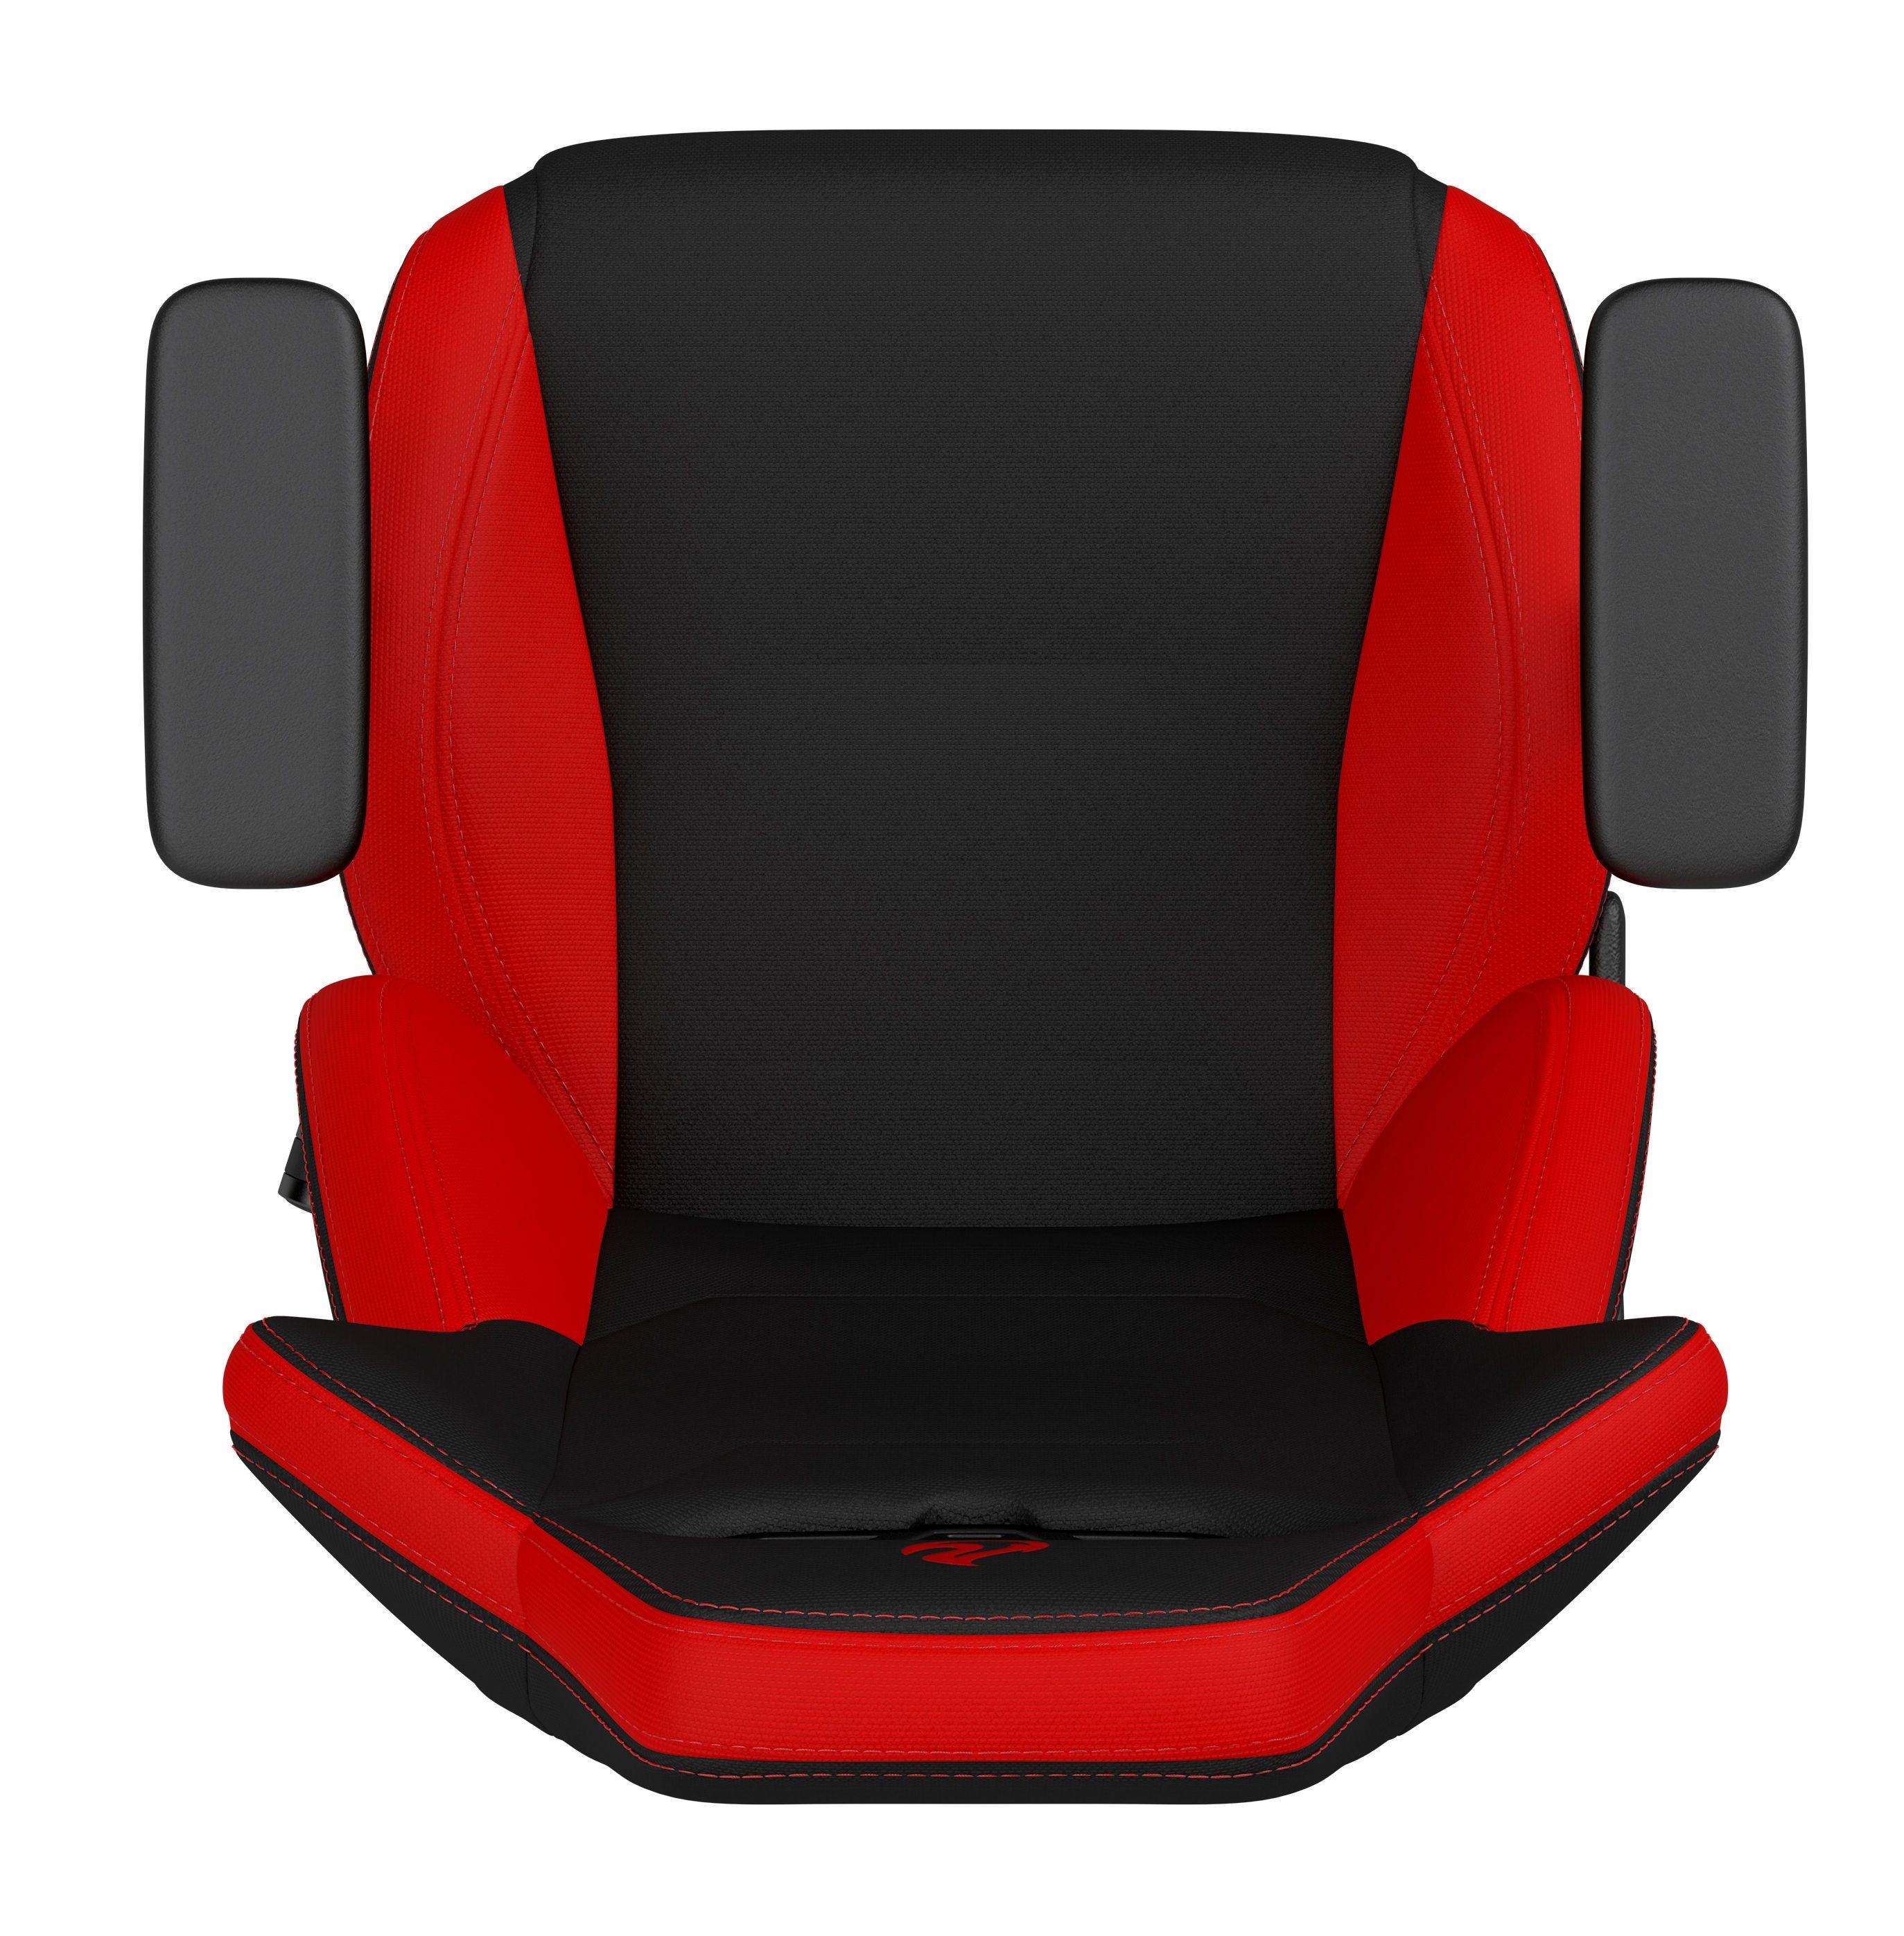 Гейминг стол Nitro Concepts - S300, inferno red - 6